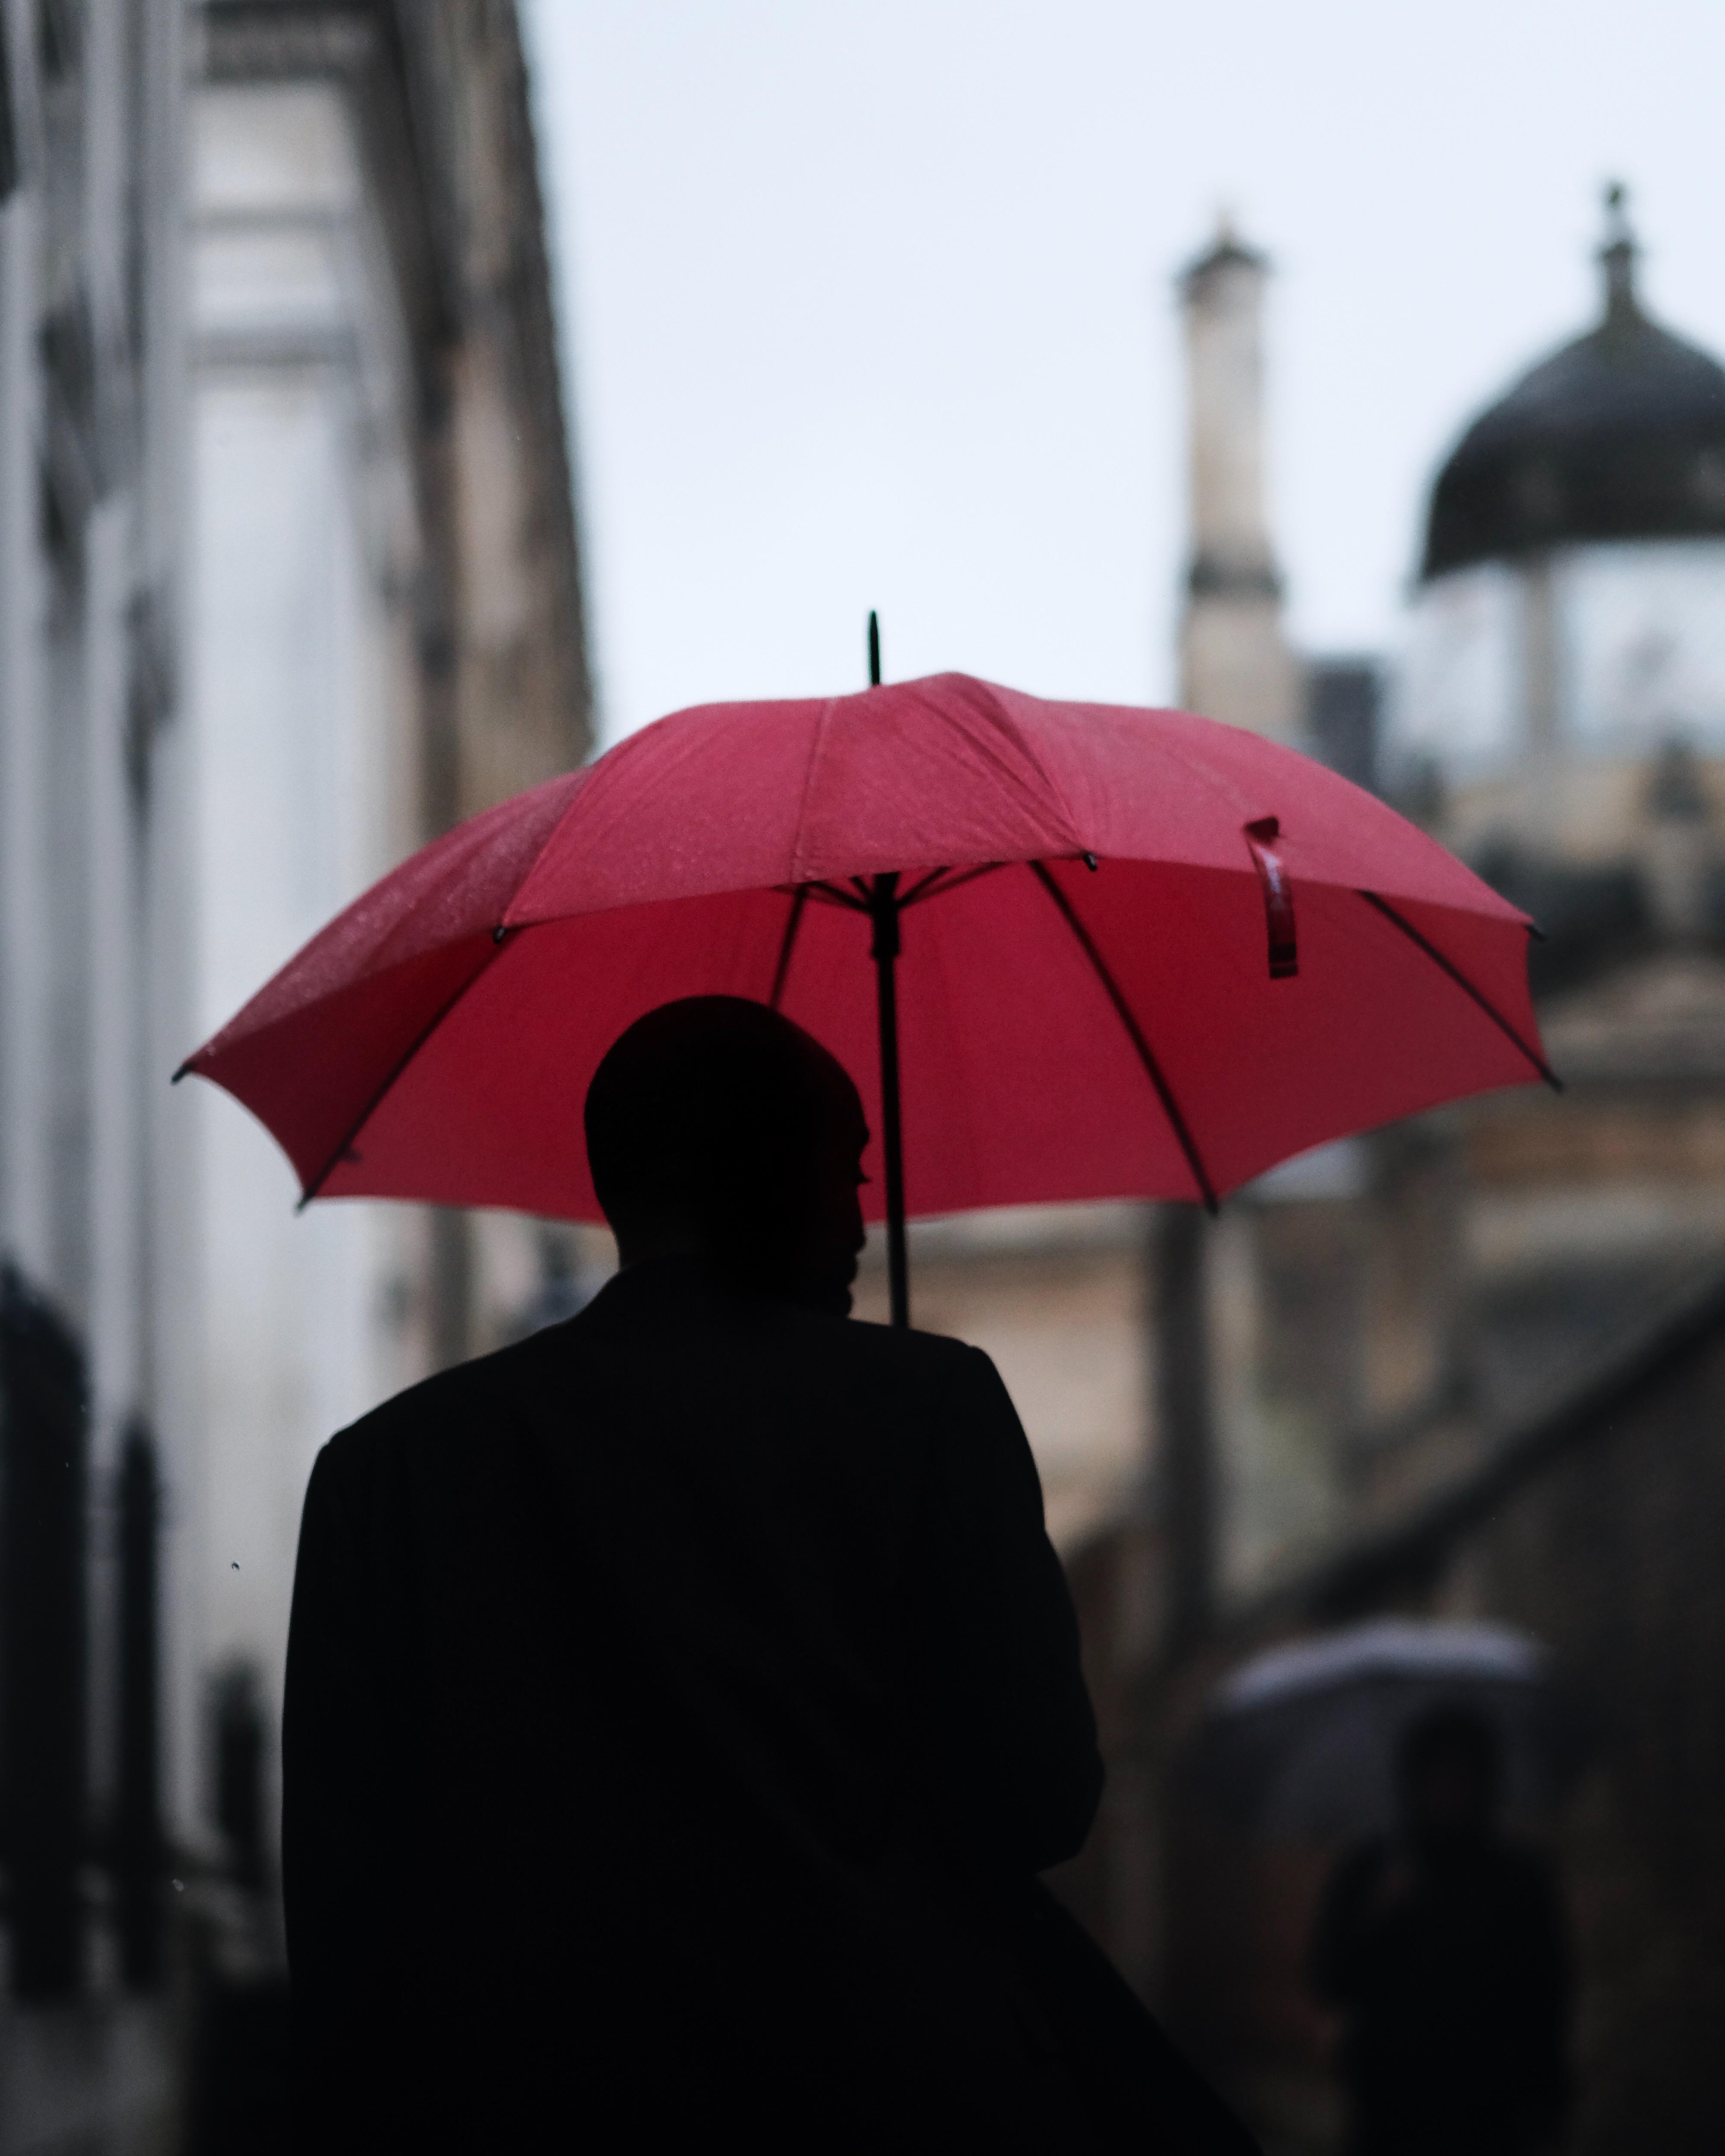 Free Images : rain, red, umbrella, color, fashion ...